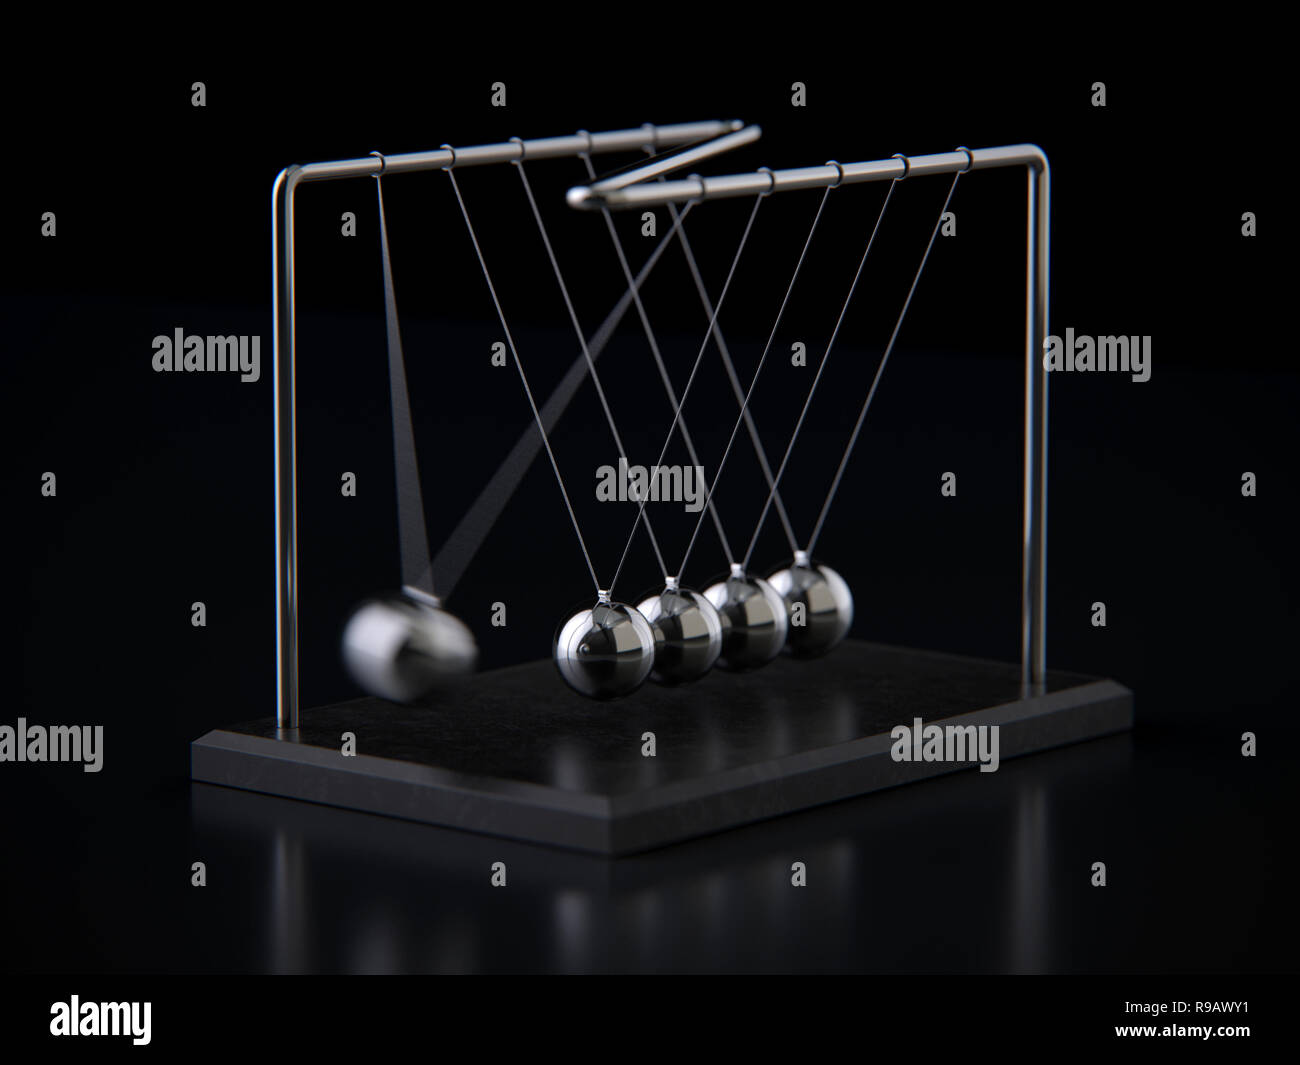 Balancing Balls Newton's Cradle, 3d rendering,conceptual image. Stock Photo